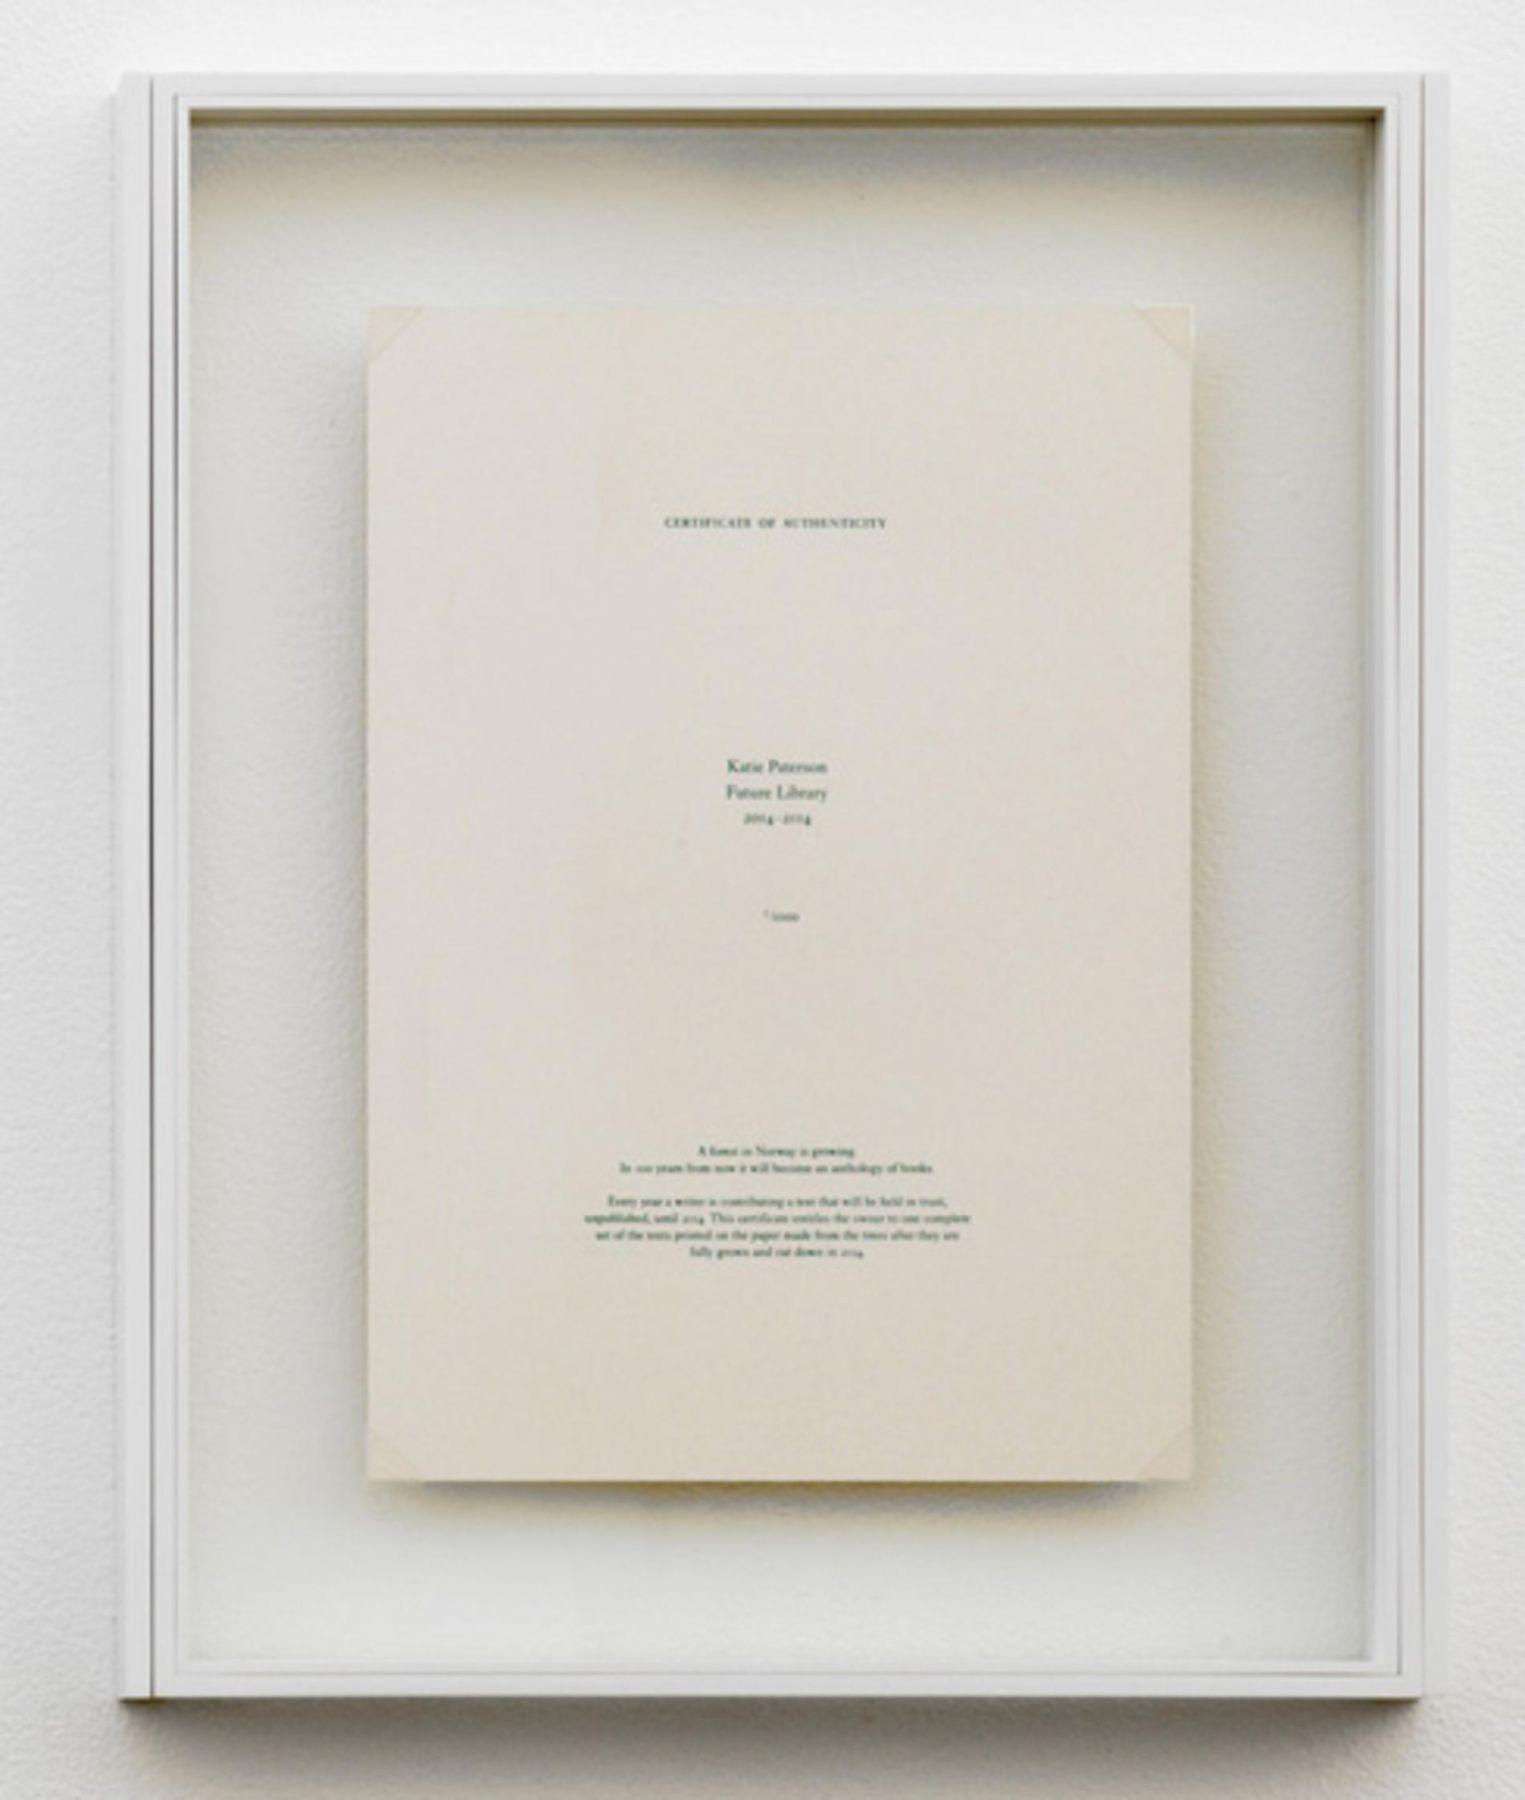 , Katie Paterson, Future Library (certificate), 2014 (reverse)